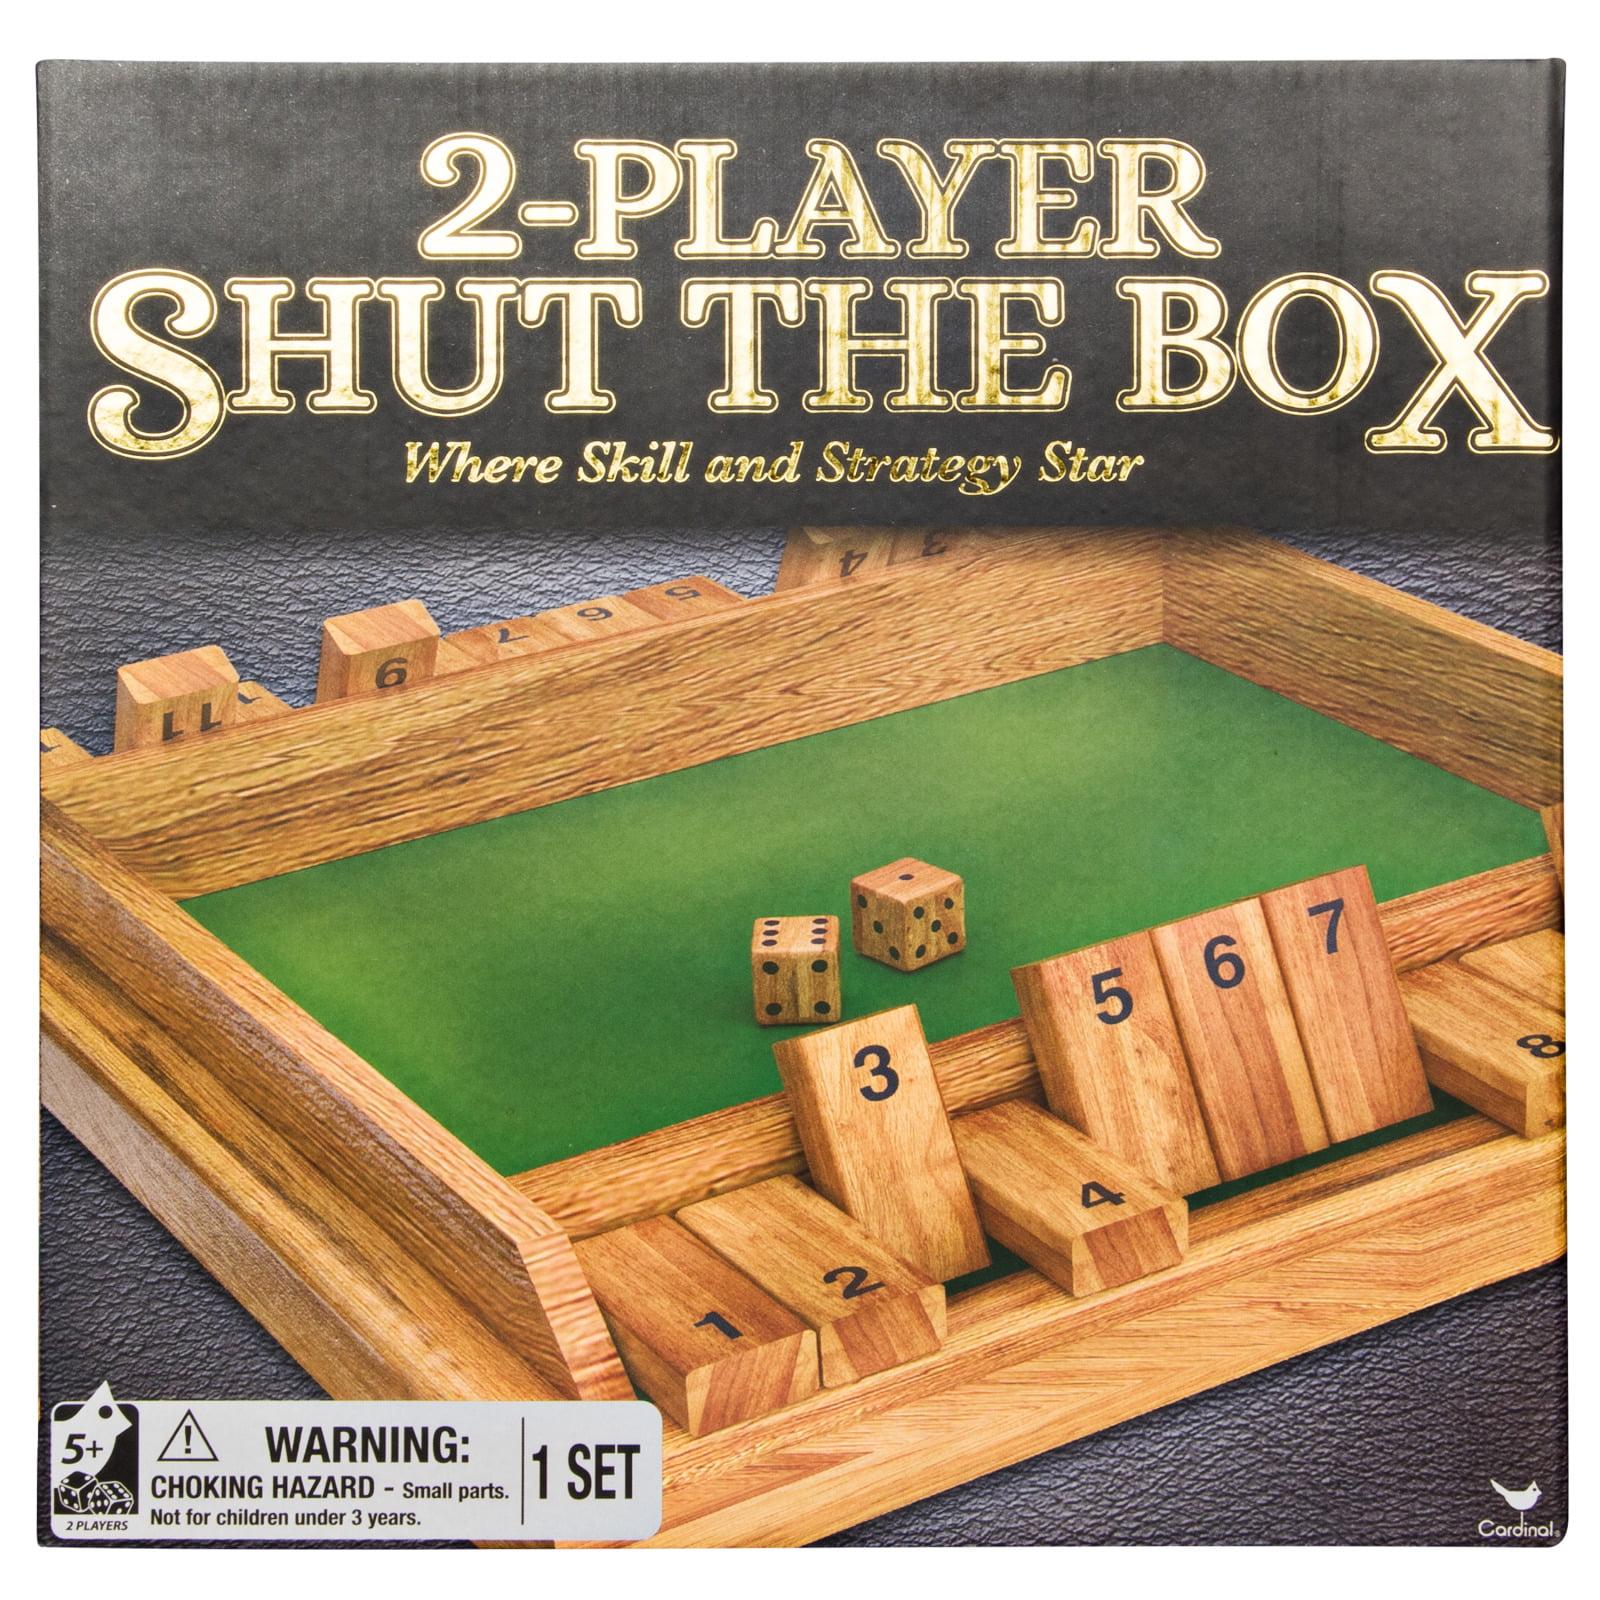 Dice Three Hands Wood Box Set of 4